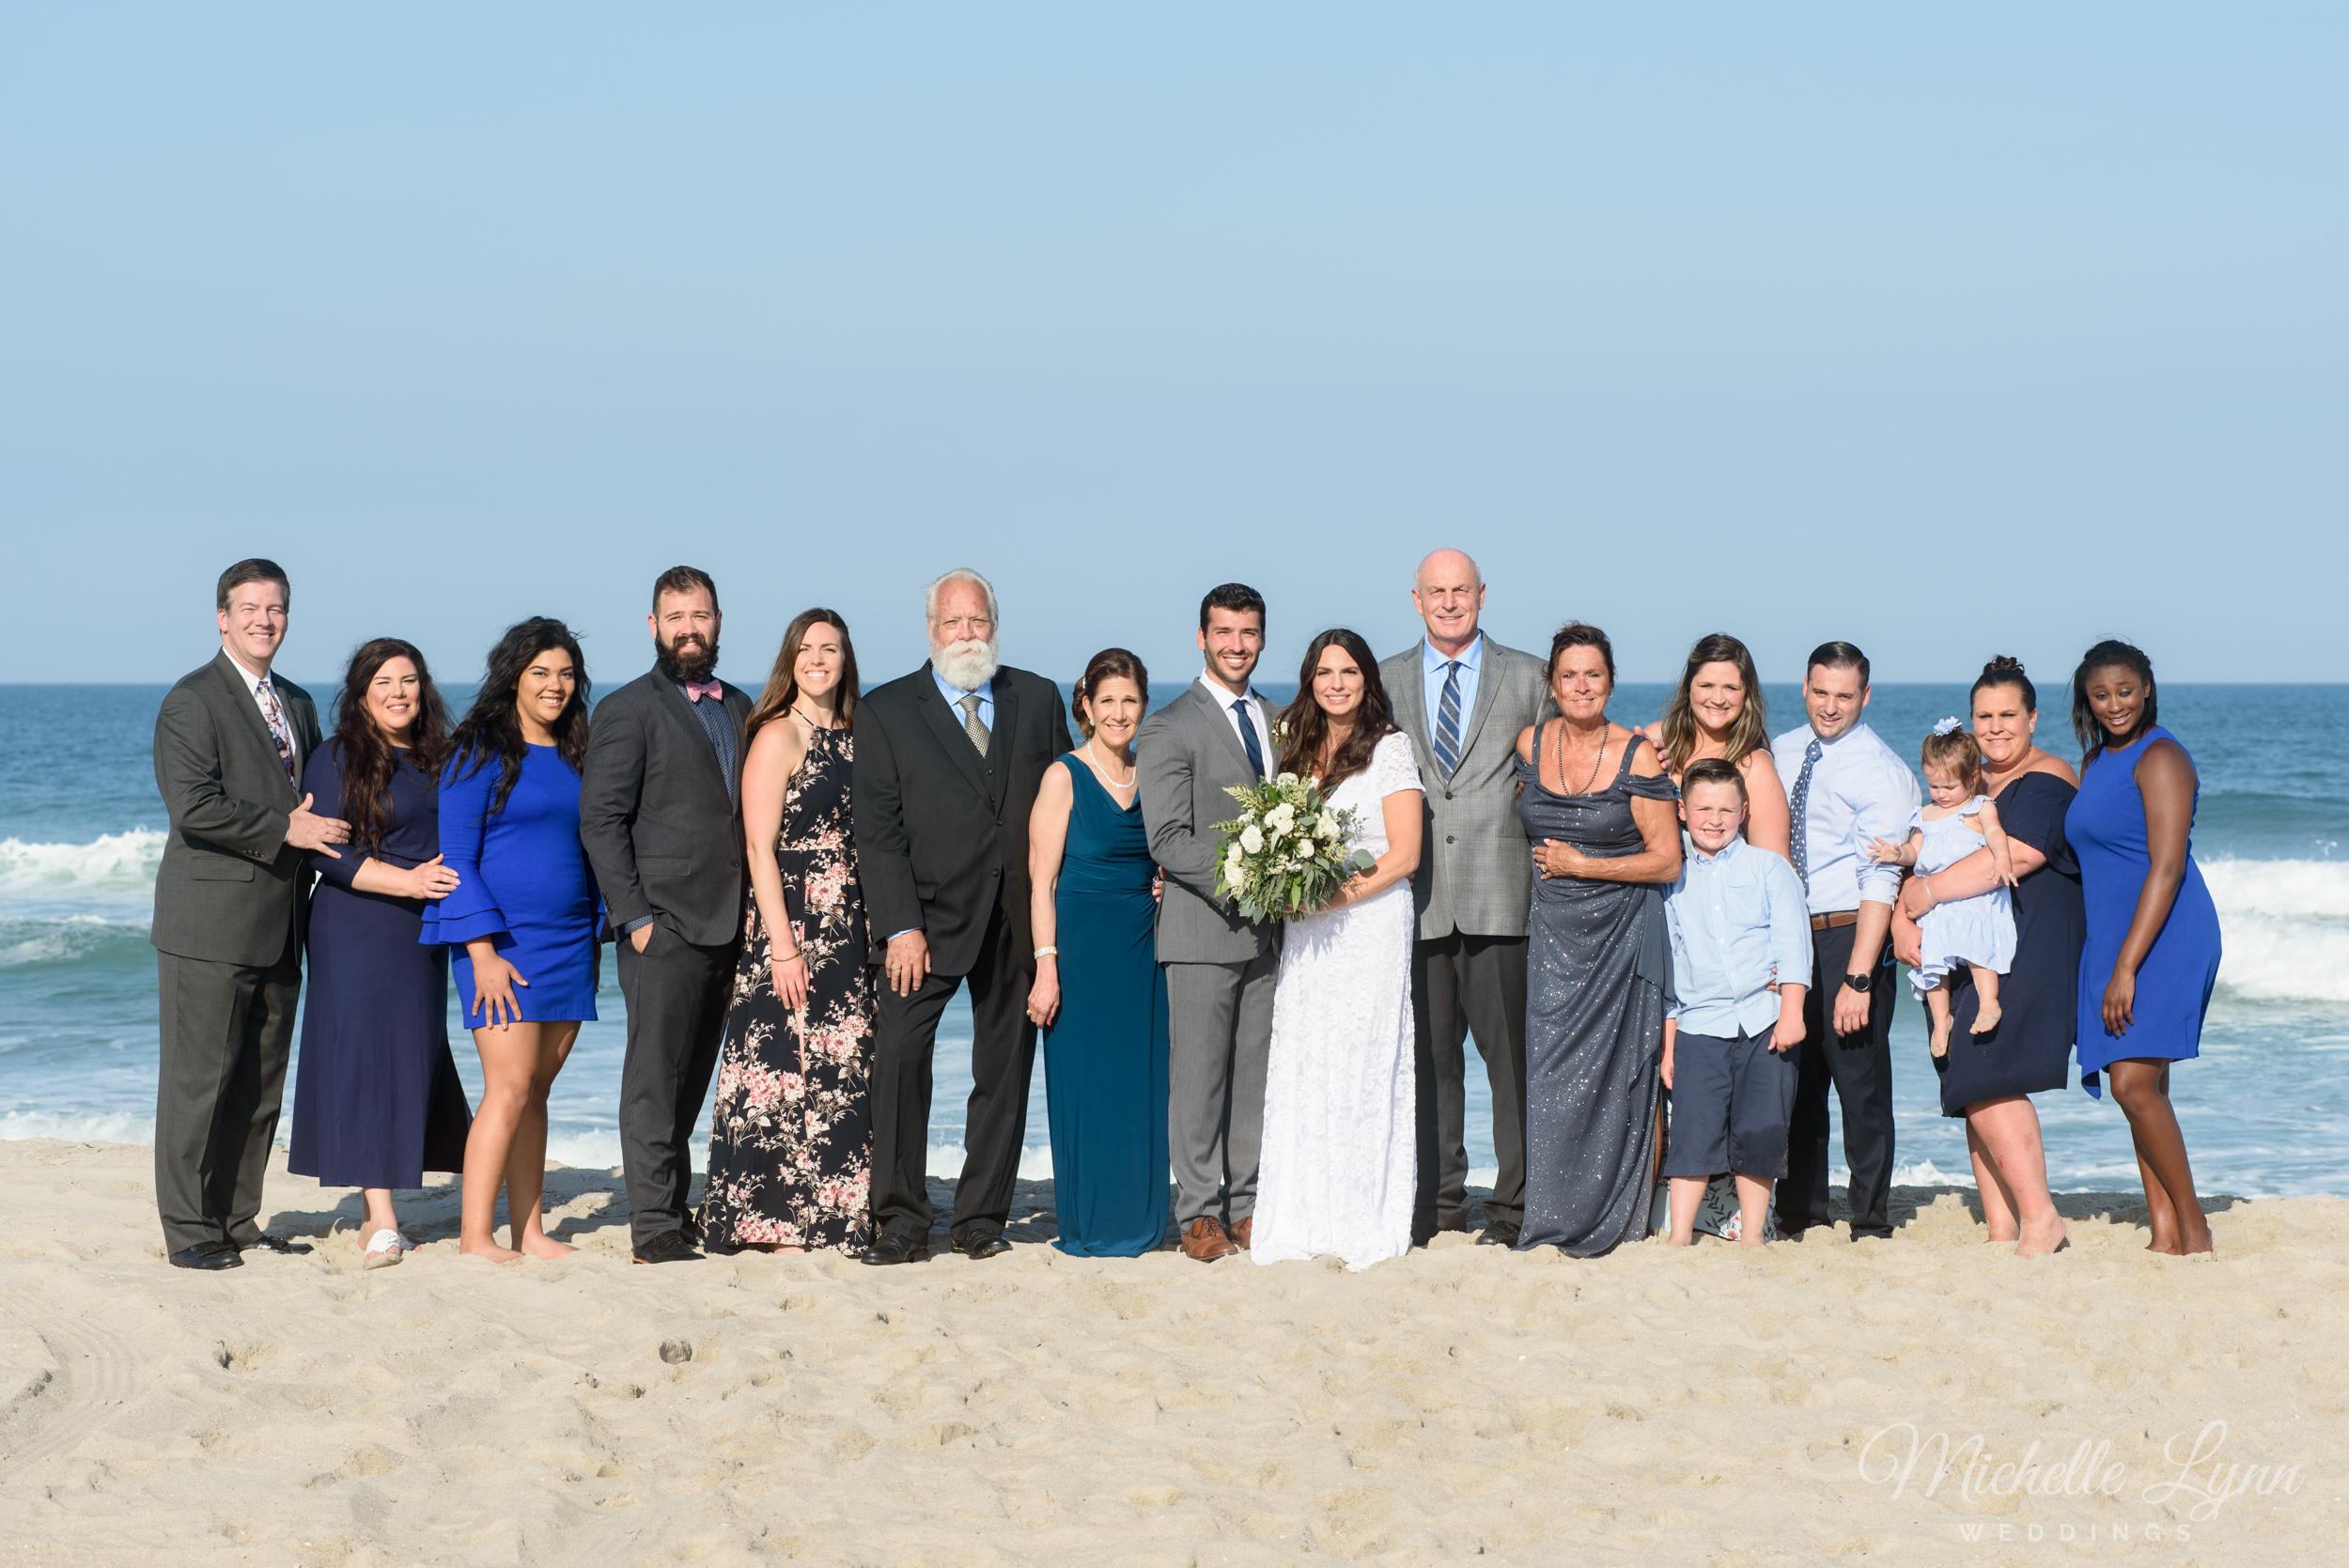 mlw-long-beach-island-new-jersey-wedding-photography-1.jpg